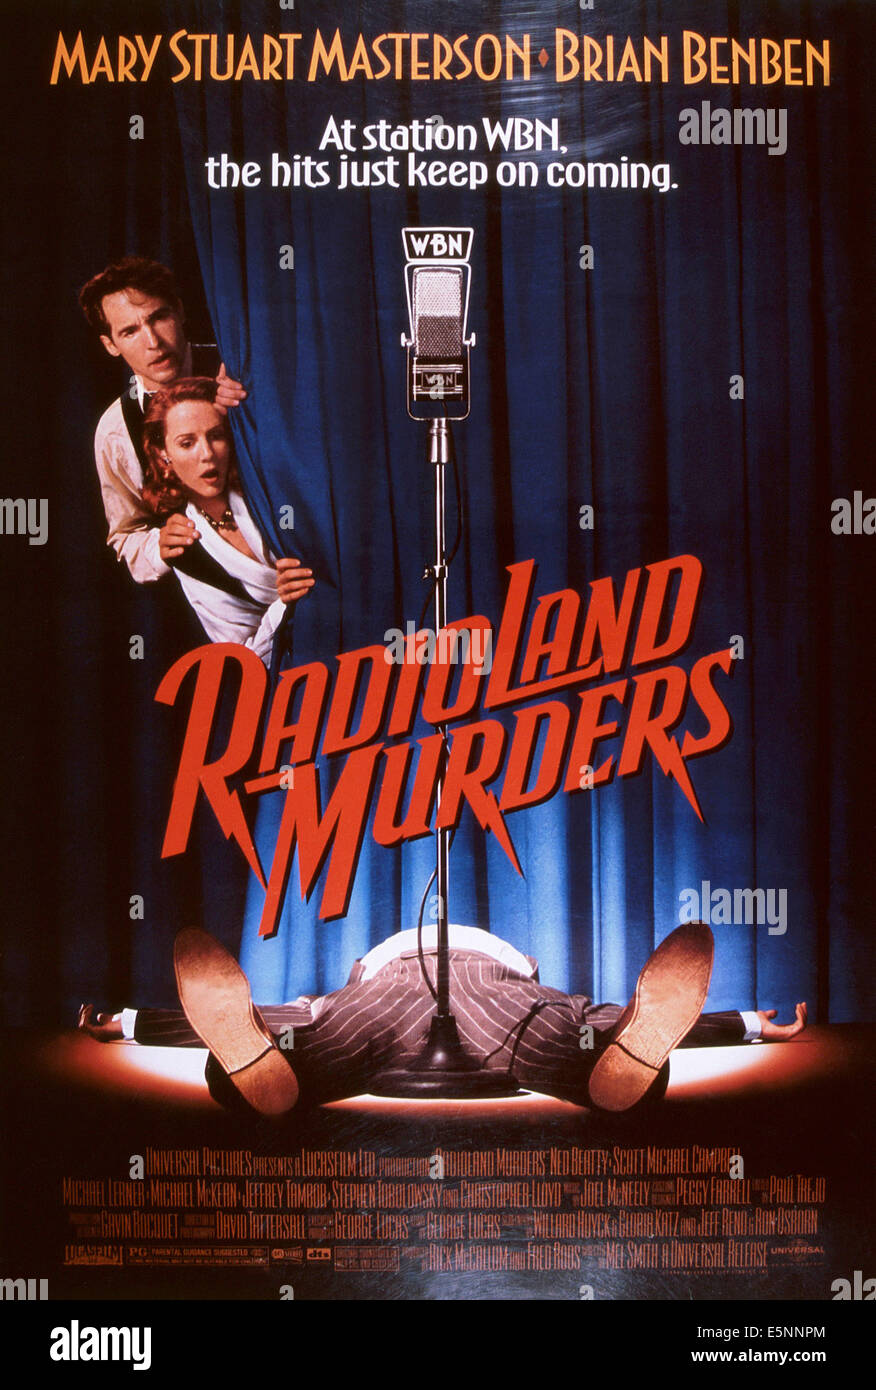 RADIOLAND MURDERS, US poster, from left: Brian Benben, Mary Stuart Masterson, 1994, © Universal/courtesy Everett Stock Photo